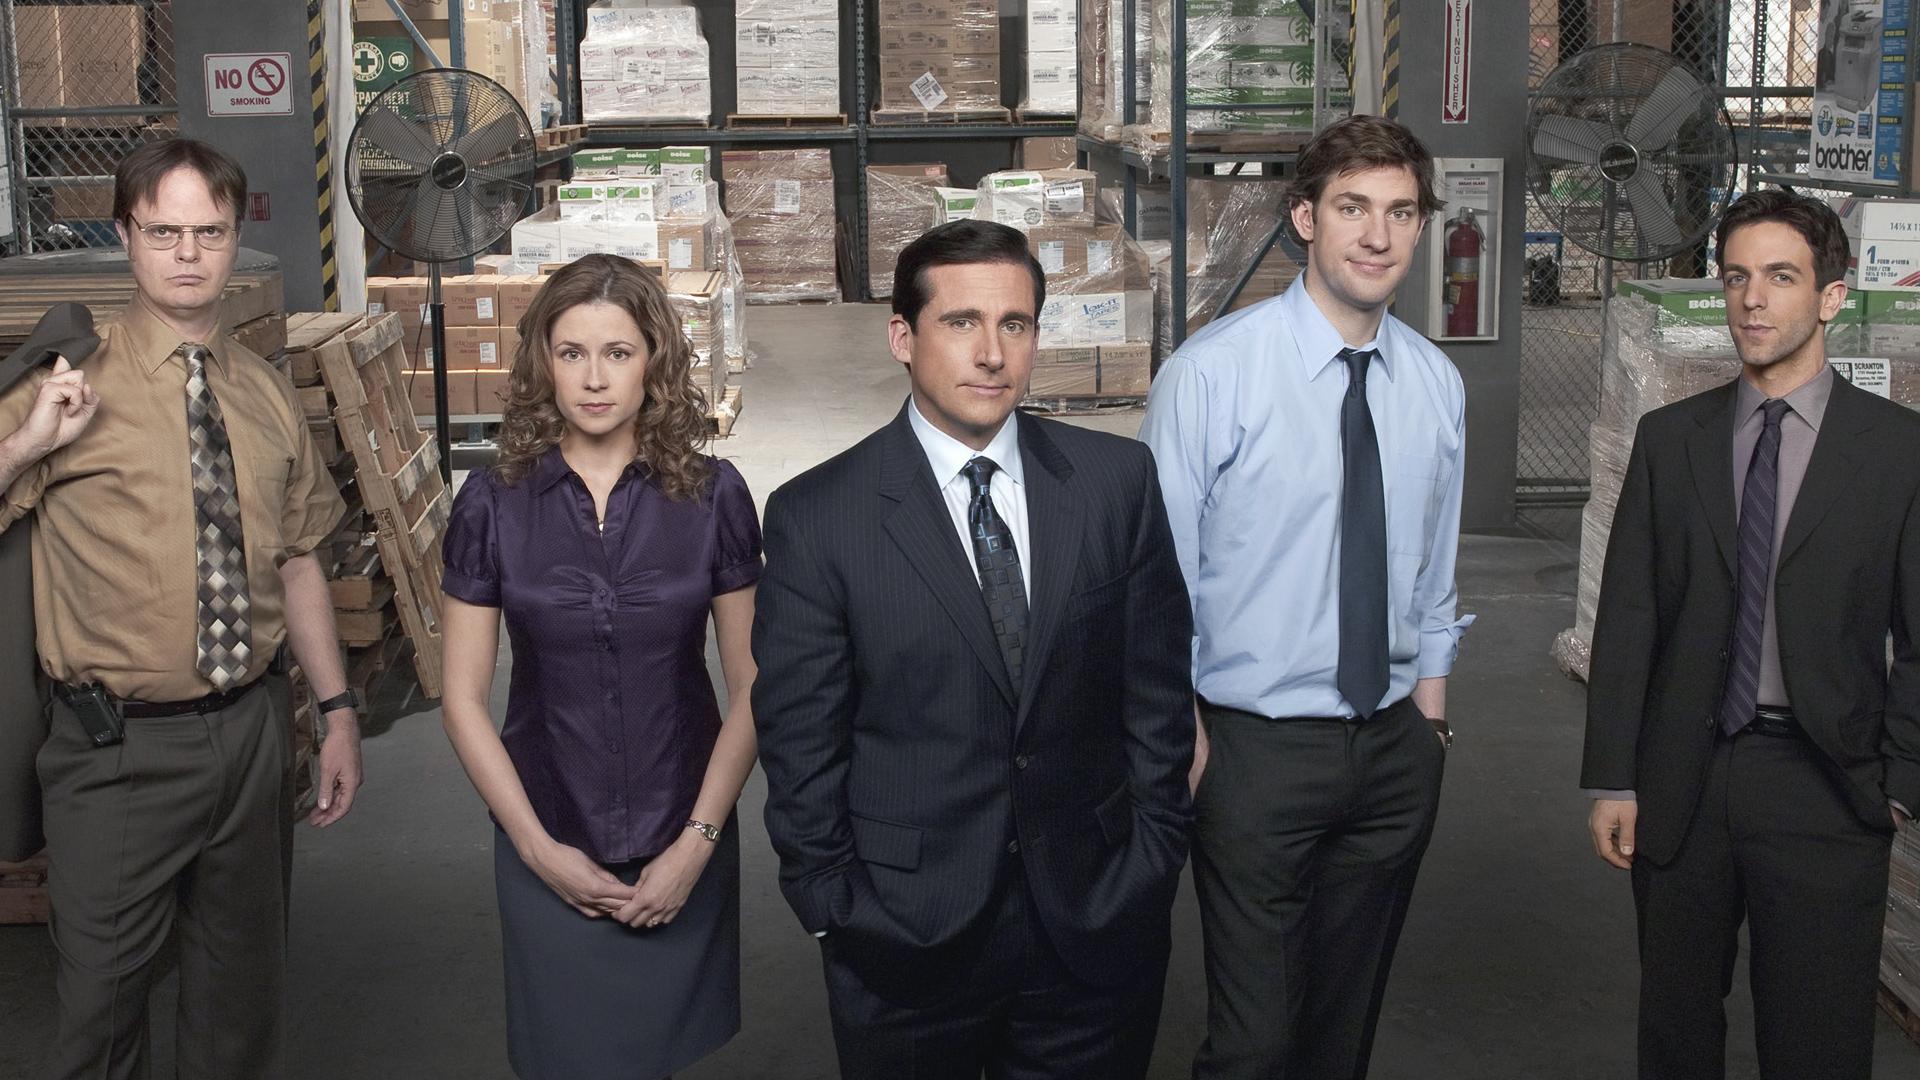 The Office crew